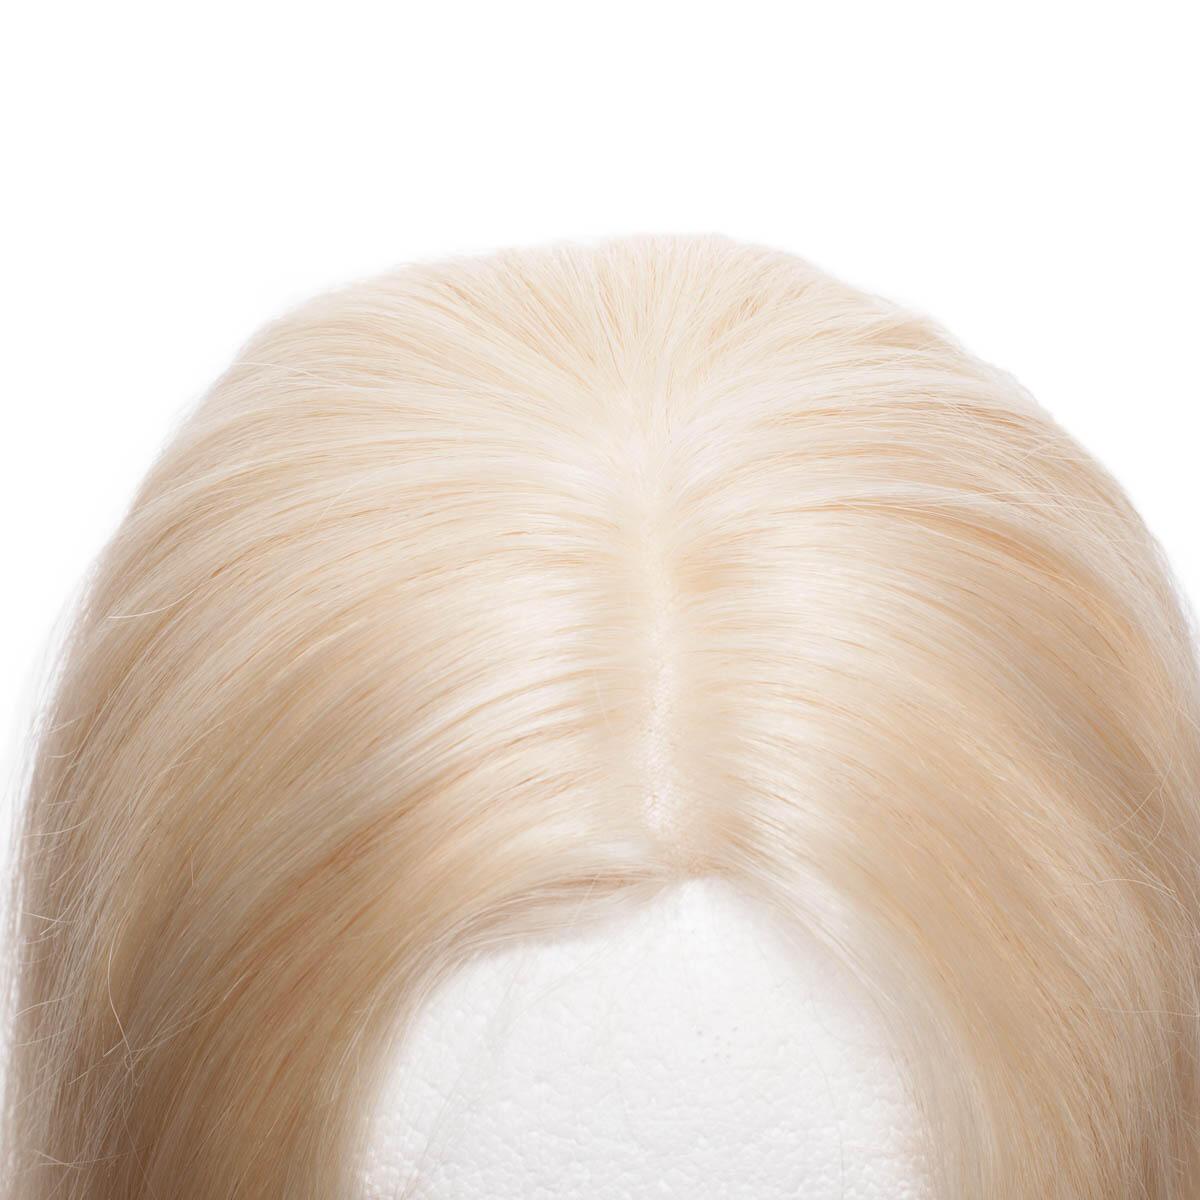 Top Piece Original Glatt 10.8 Light Blonde 30 cm